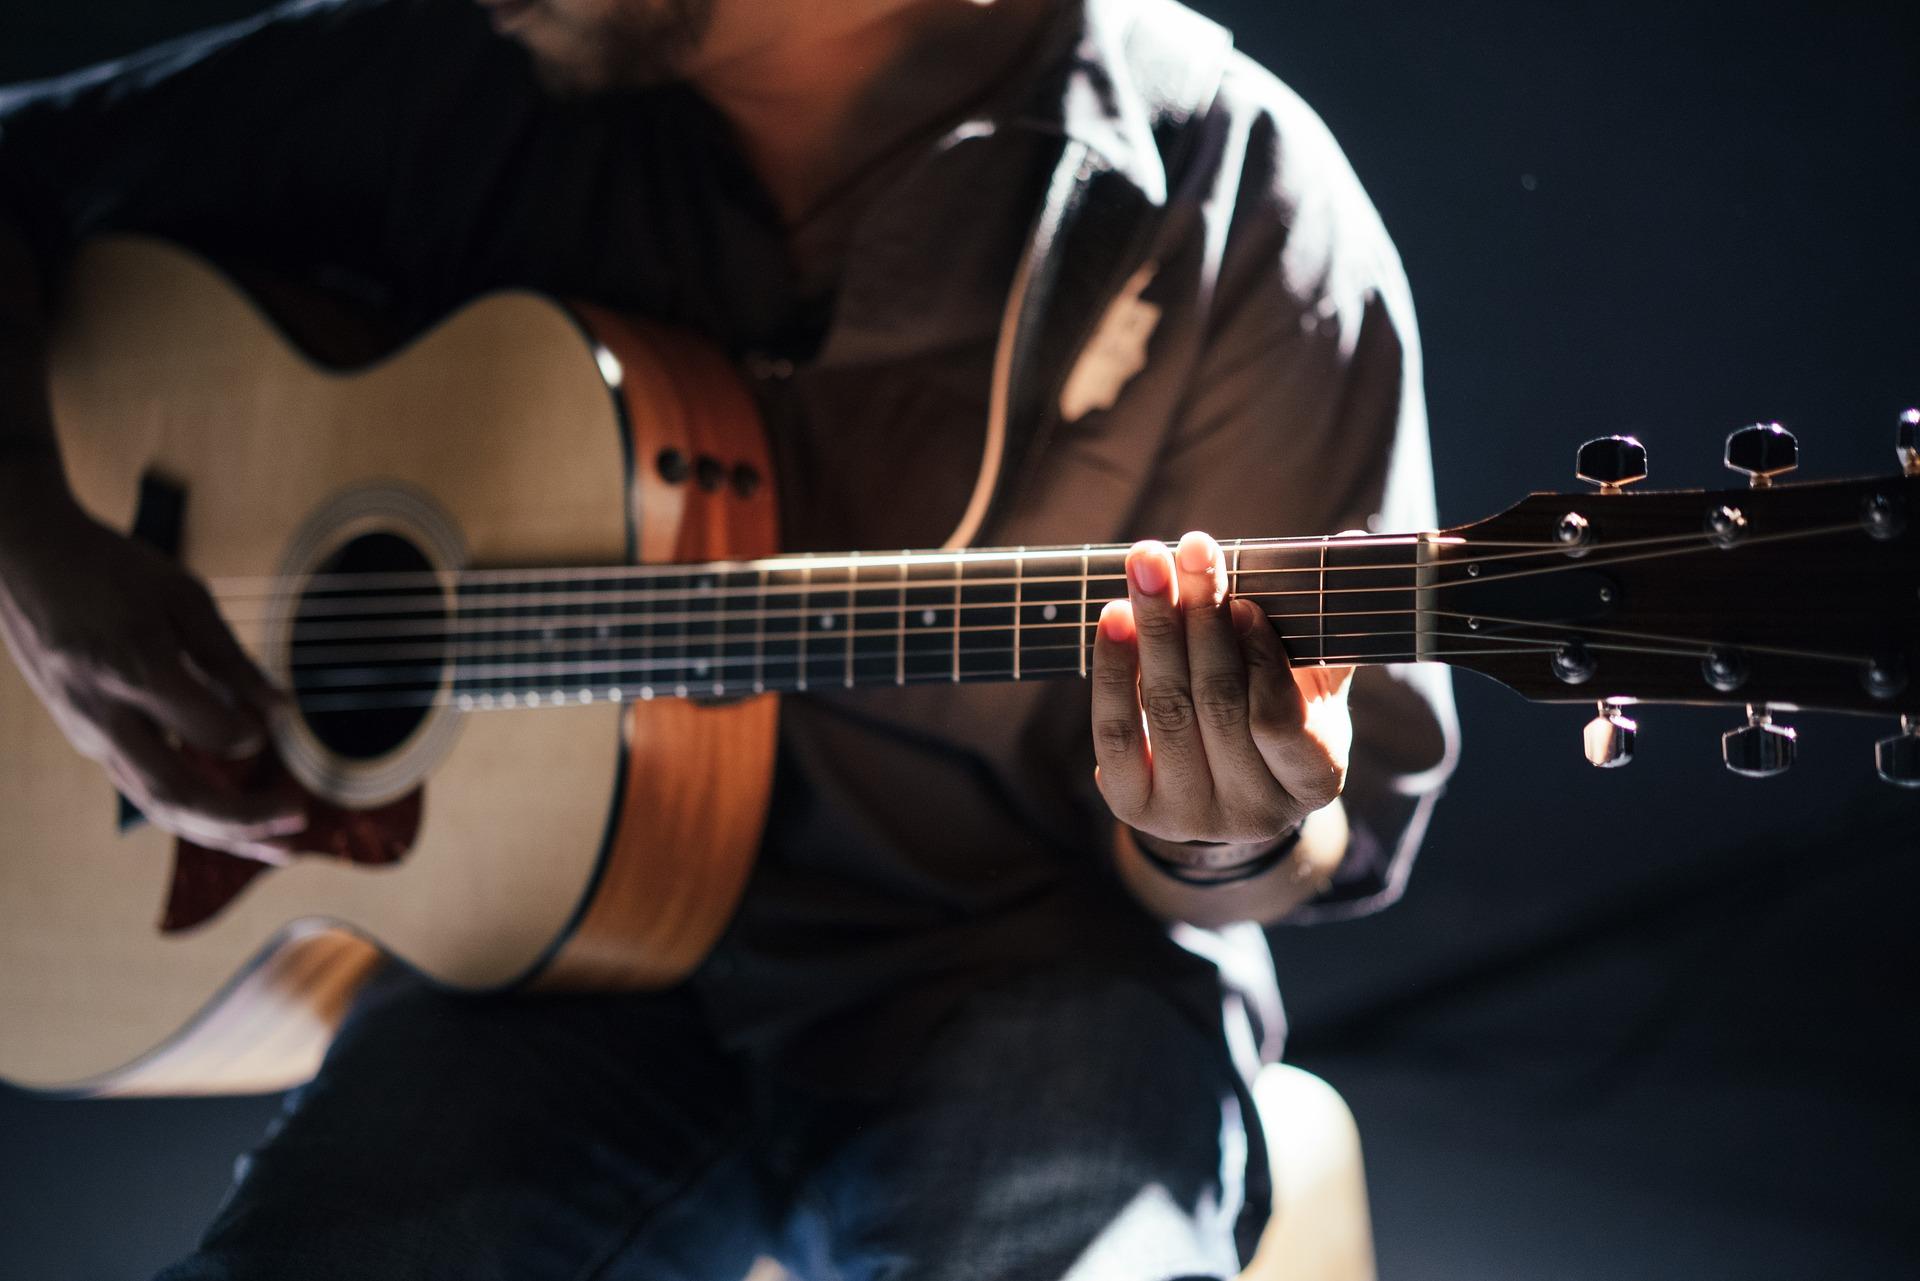 https://blog.dozmia.com/content/images/2017/11/beginner-acoustic-guitar.jpg